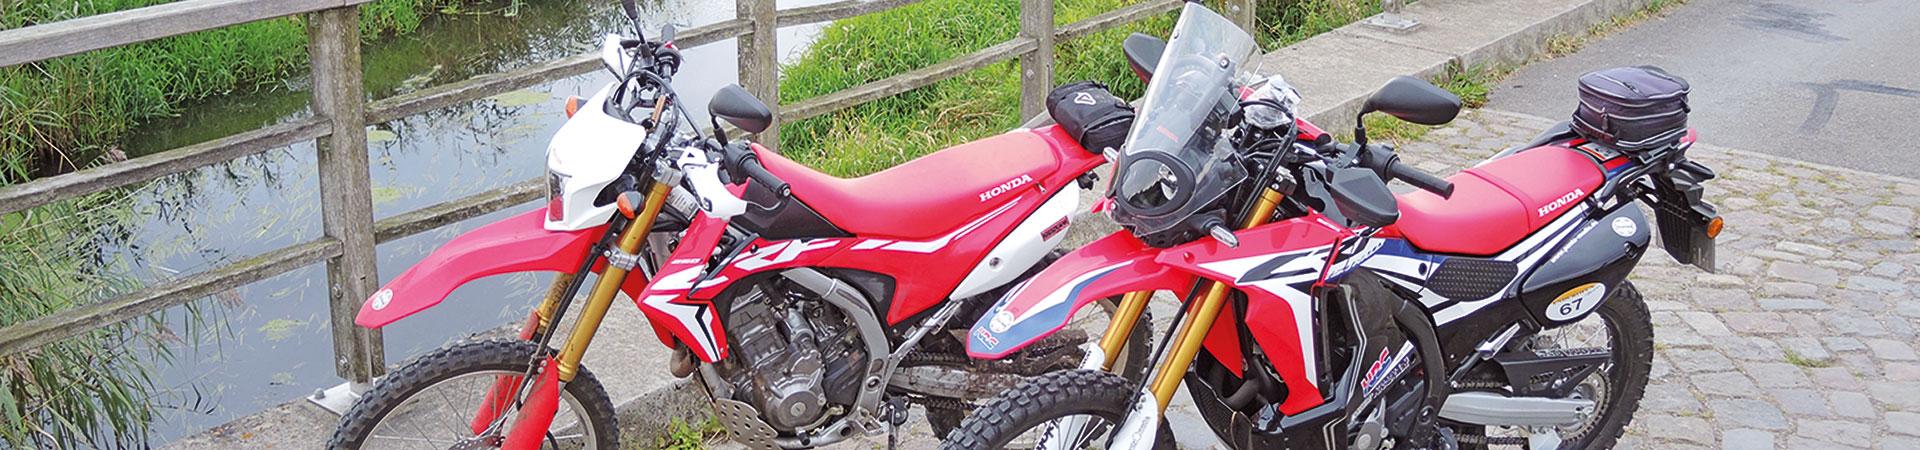 Honda-CRF-250-L-und-Rallye